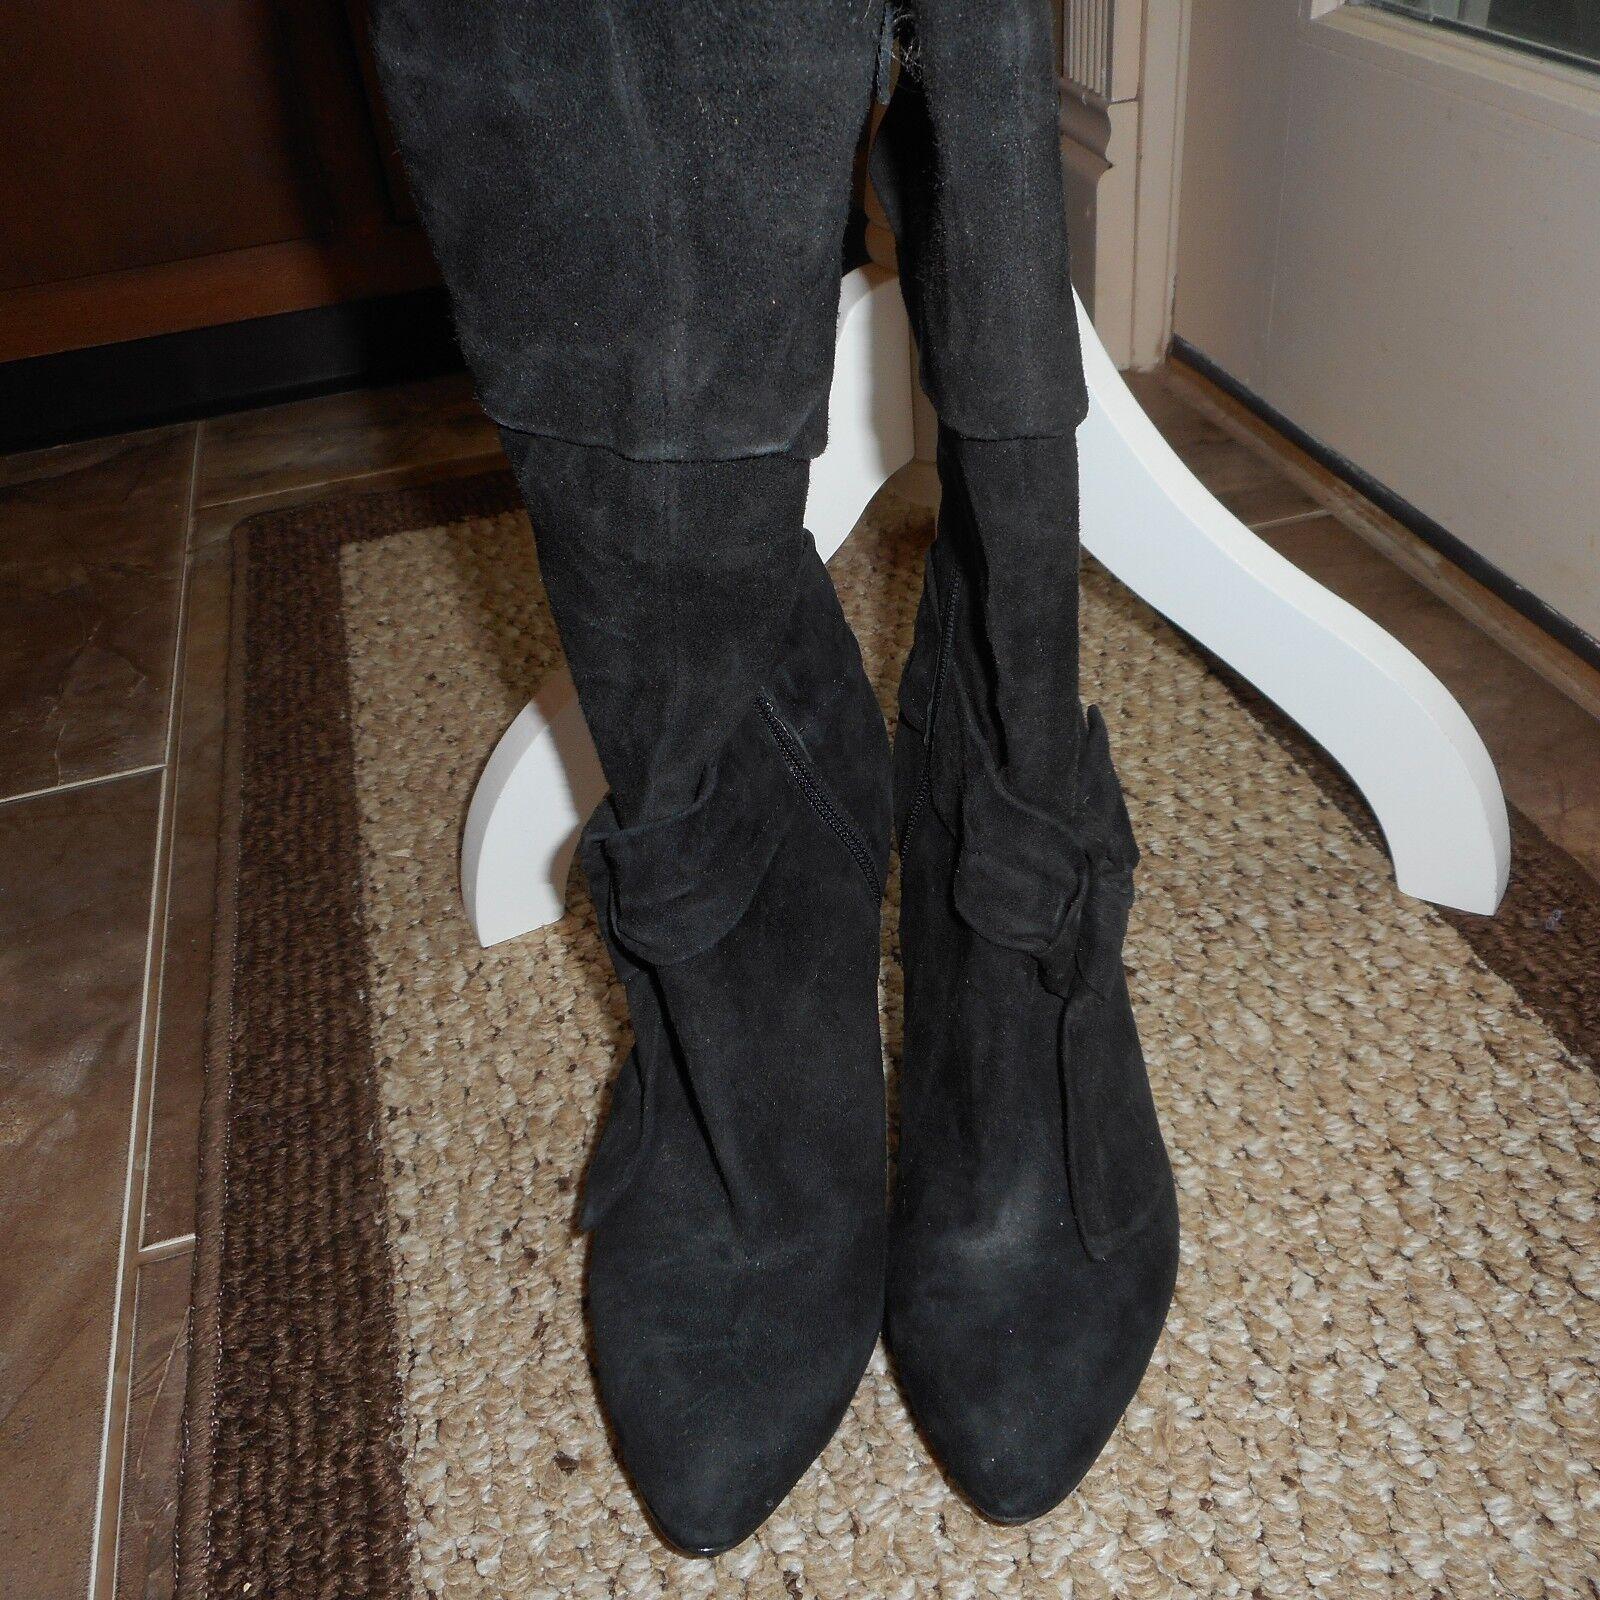 CIRCA JOAN & DAVID Women's Bow Tied Side Design Zipper Up Heel Boots